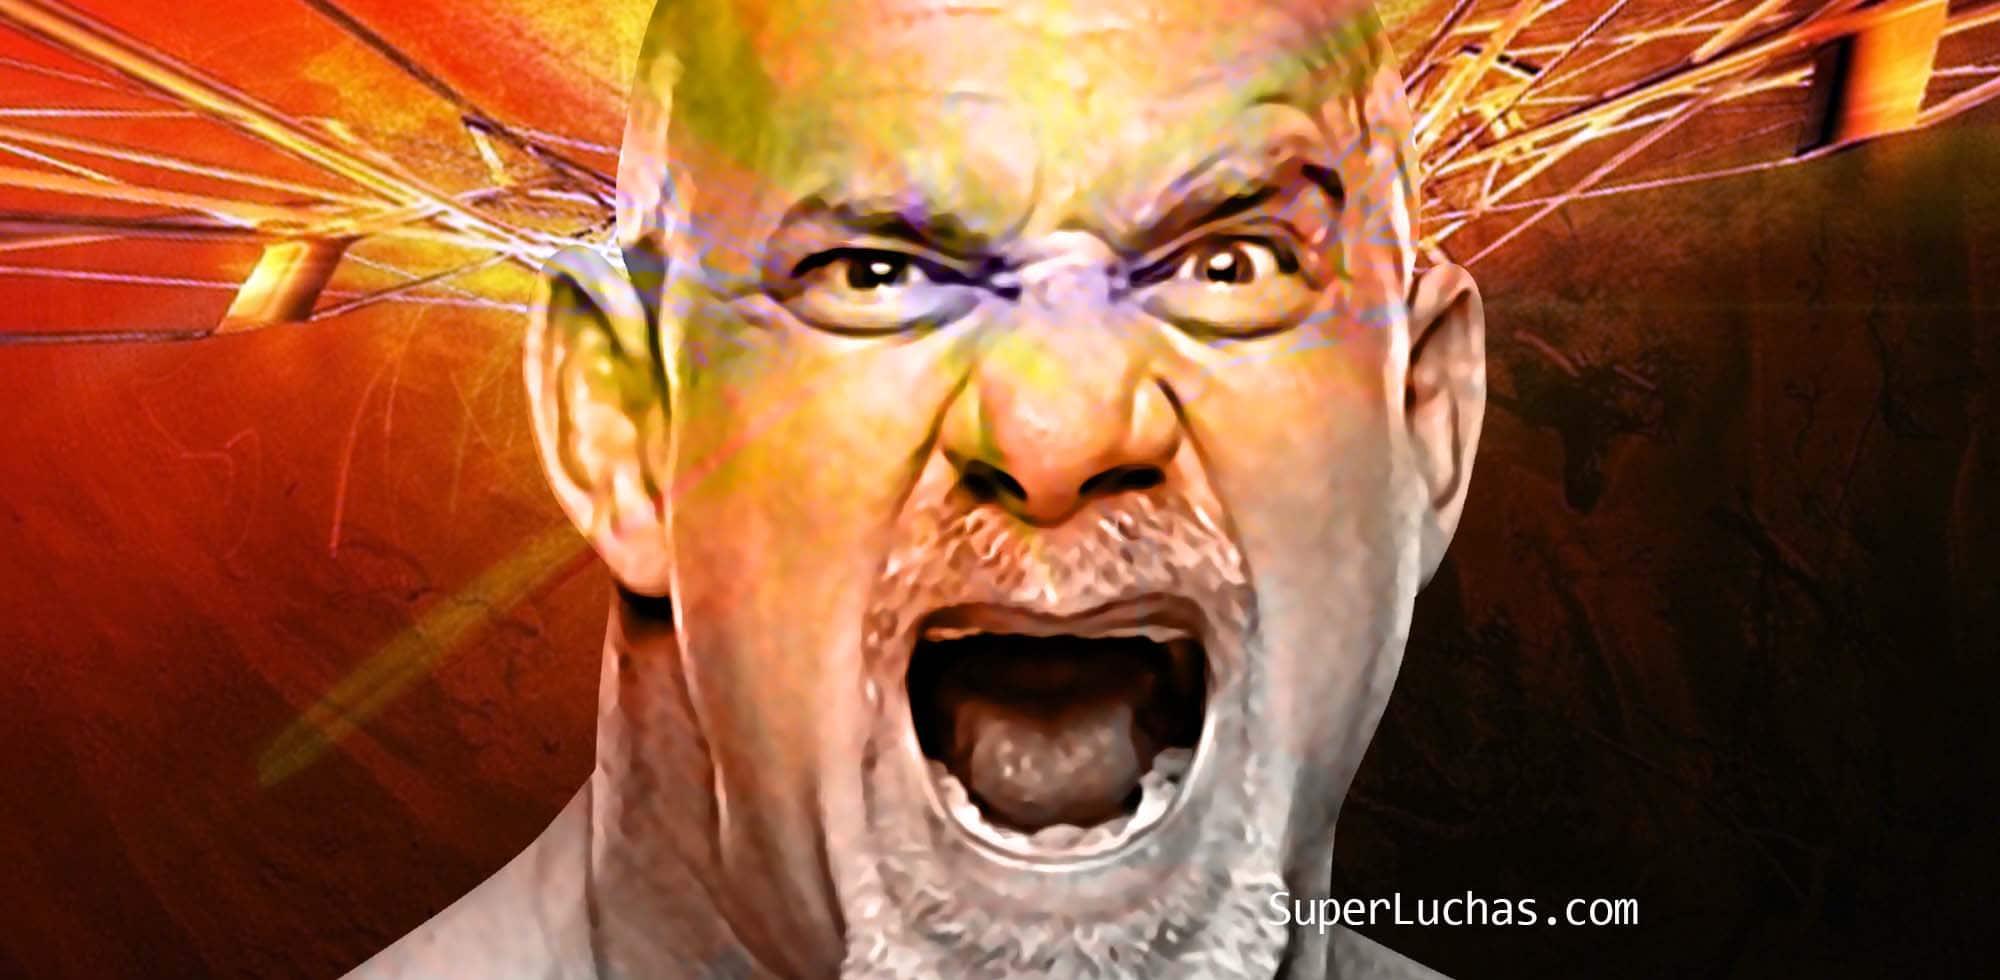 Goldberg vs. Dolph Ziggler, ¿una metáfora sobre WWE? 1